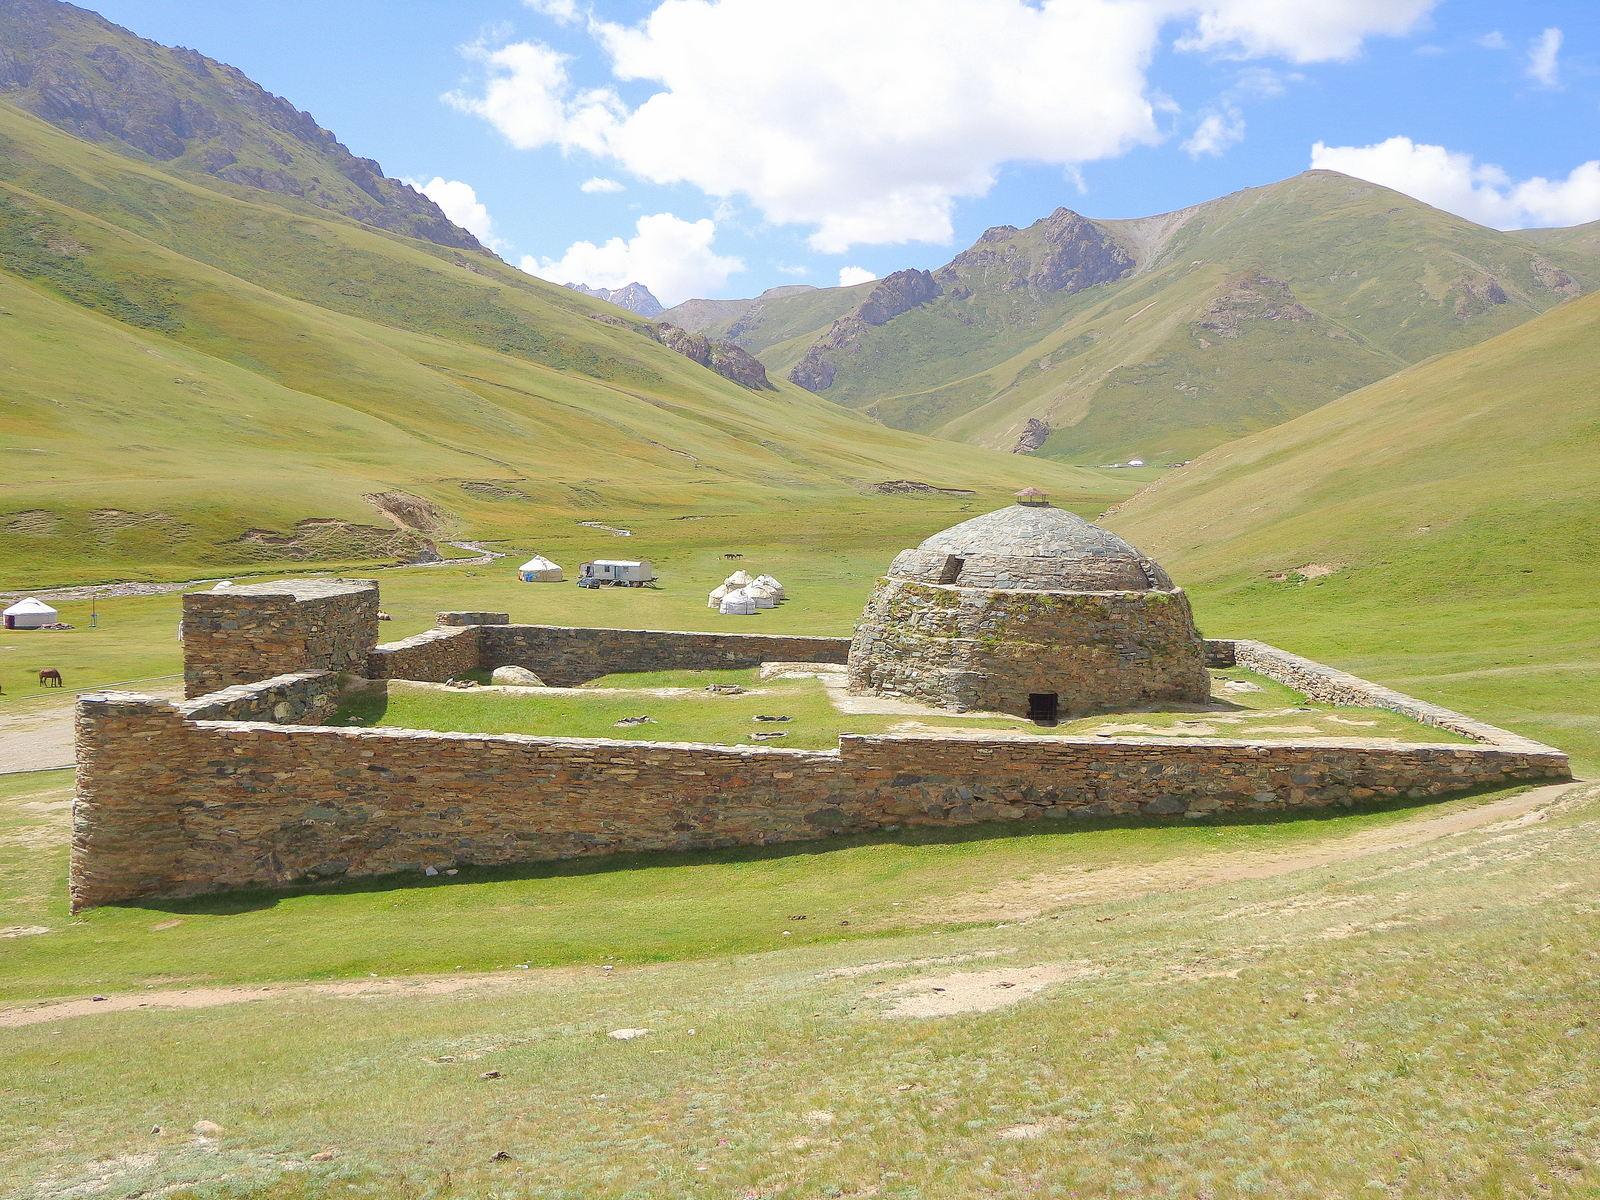 9-day Kyrgyzstan Tour Classic